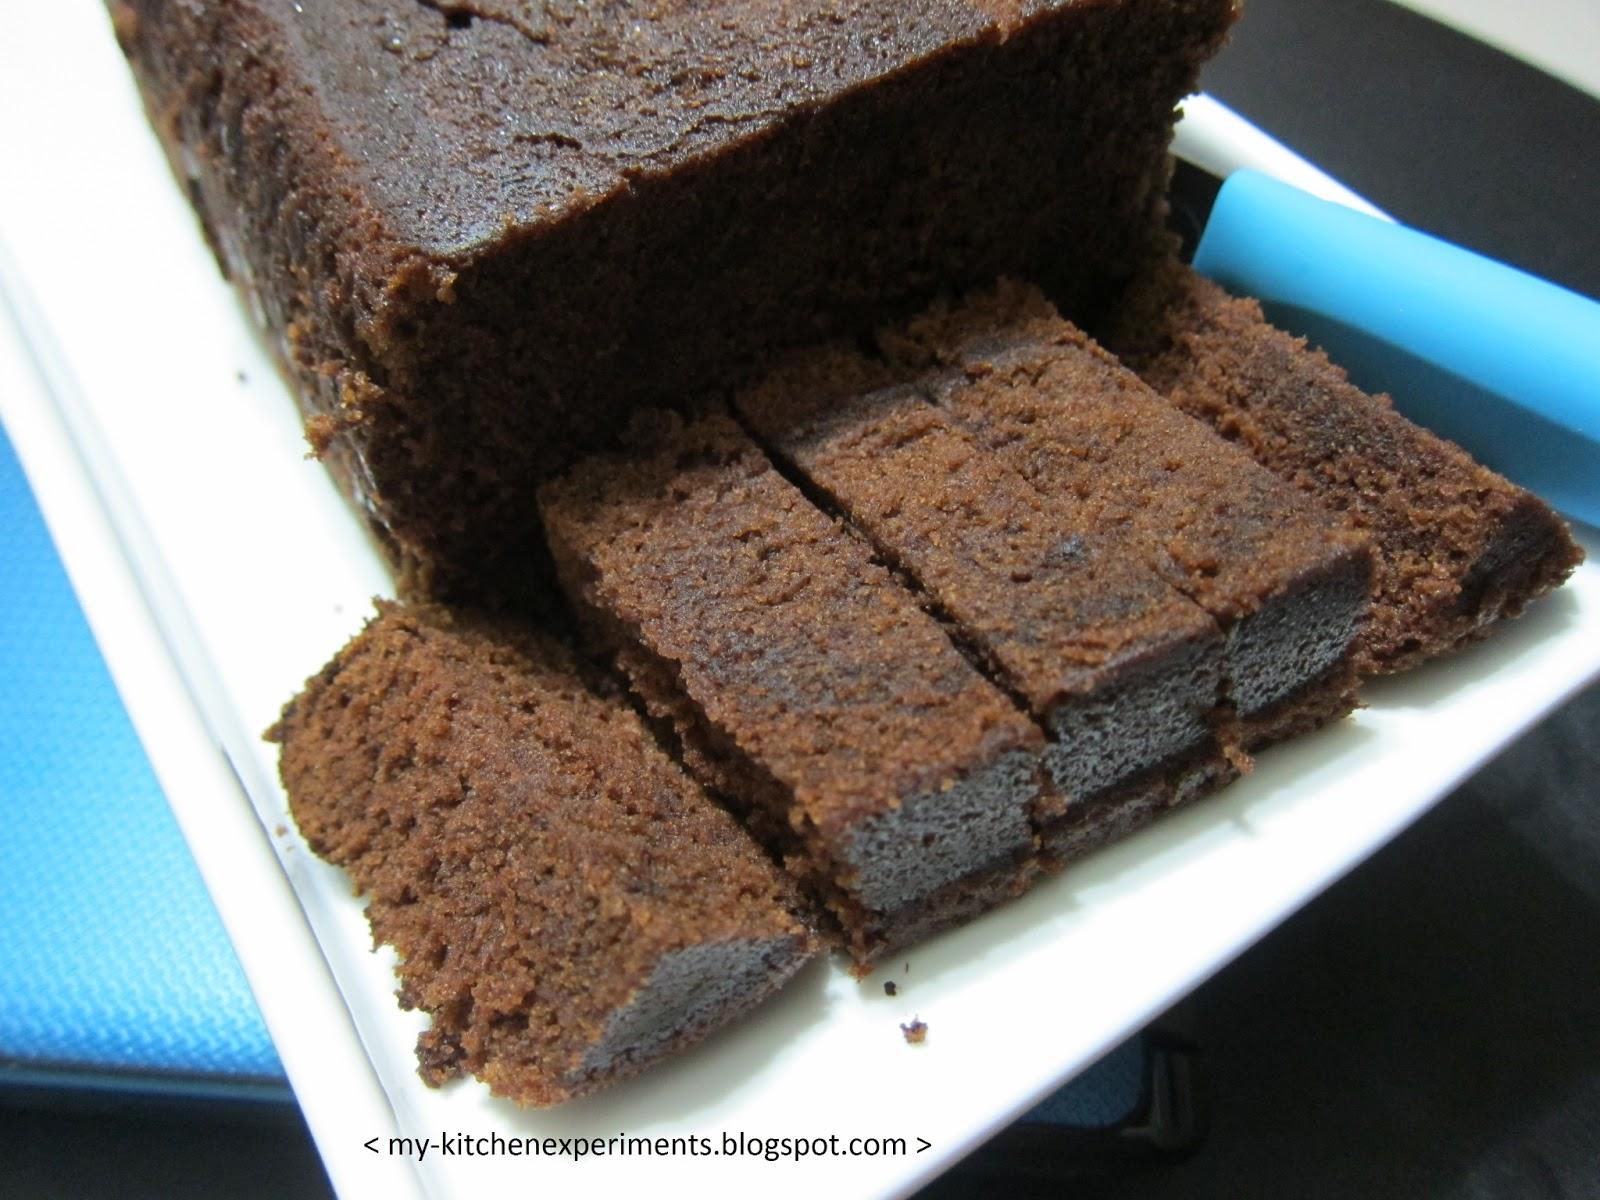 Butterscotch Cake Recipe Joy Of Baking: My Kitchen Experiments: Chocolate Butter Cake Recipe